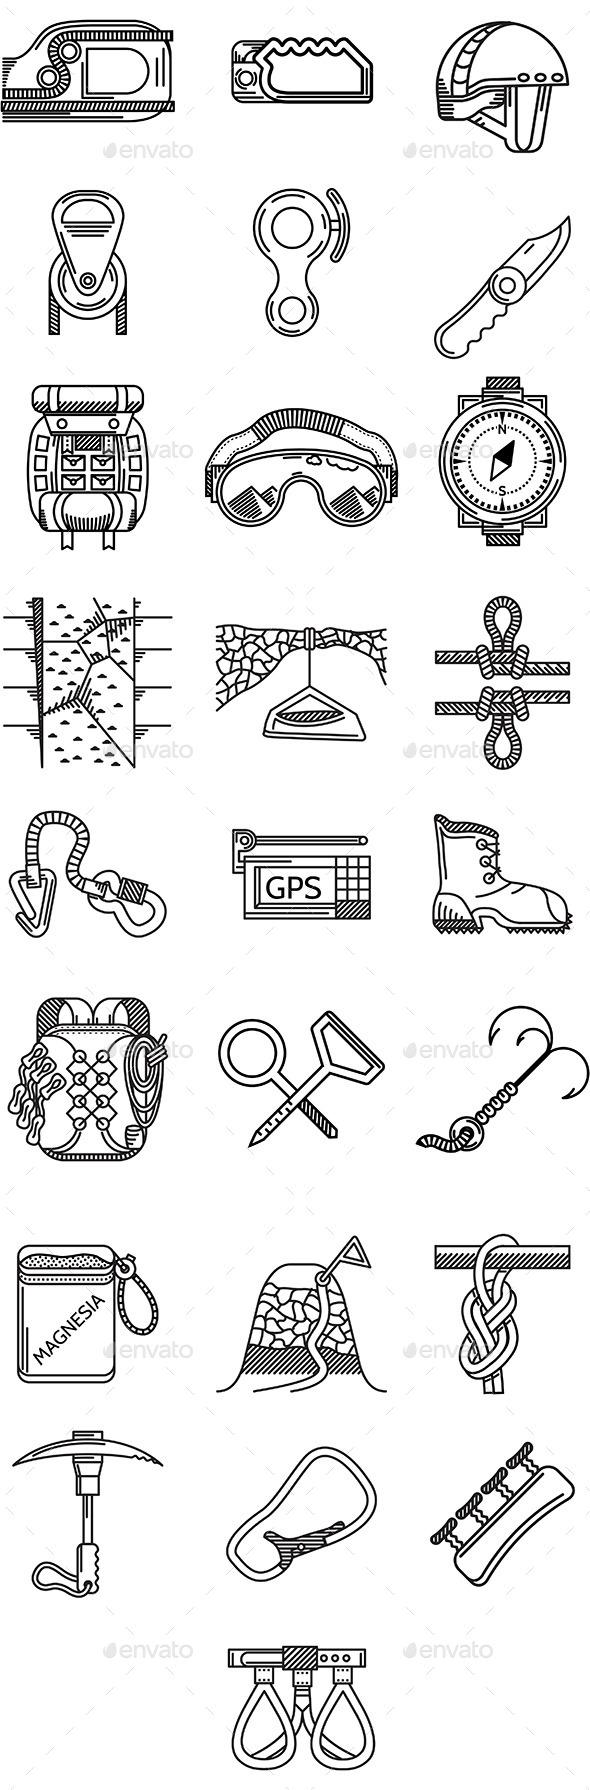 GraphicRiver Rock Climbing Icons 10522789